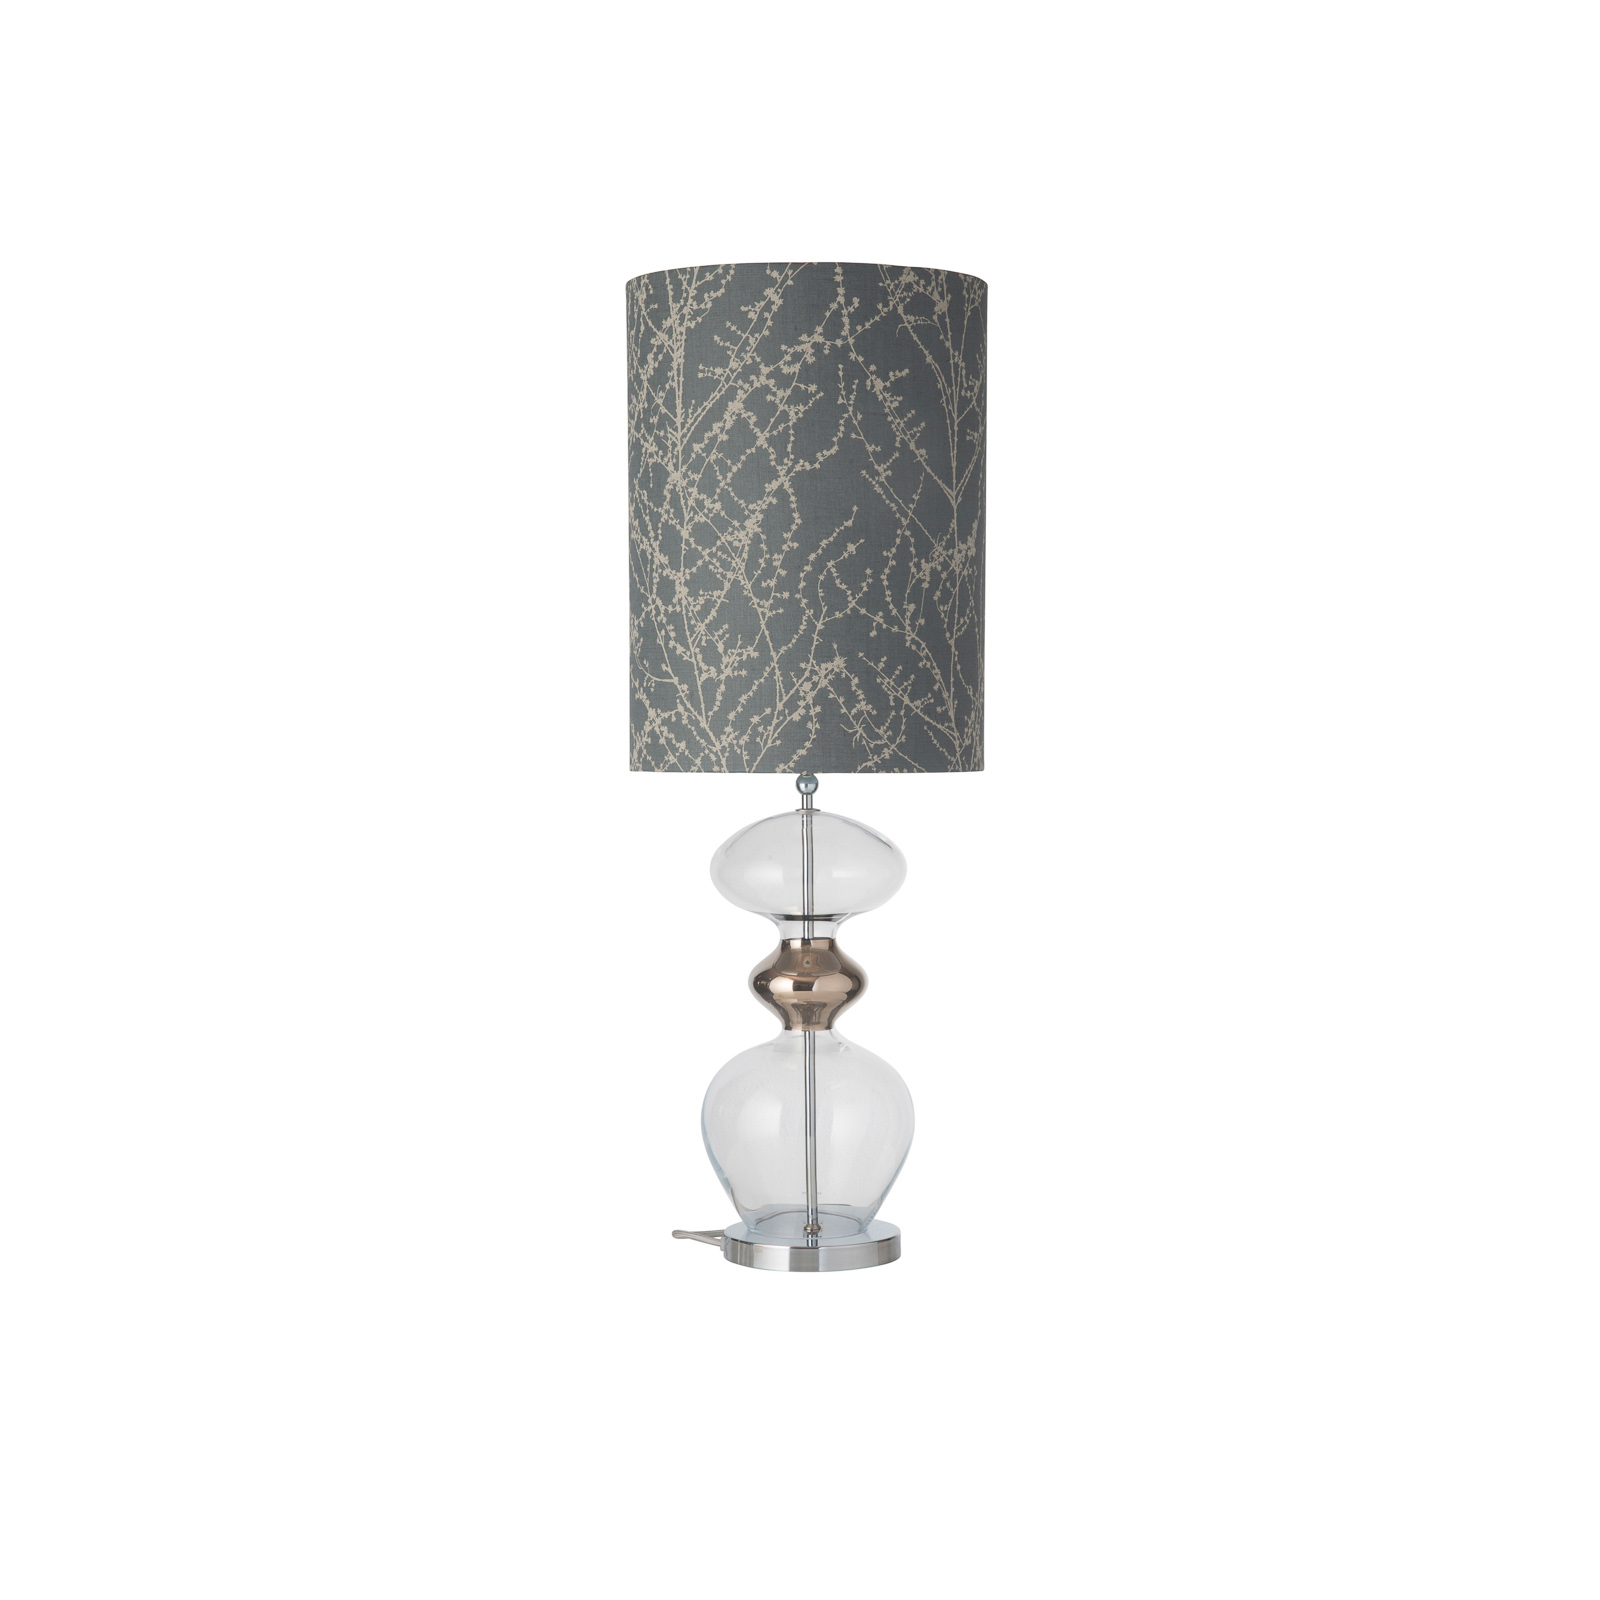 EBB & FLOW Futura bordlampe, Branches grey/silver